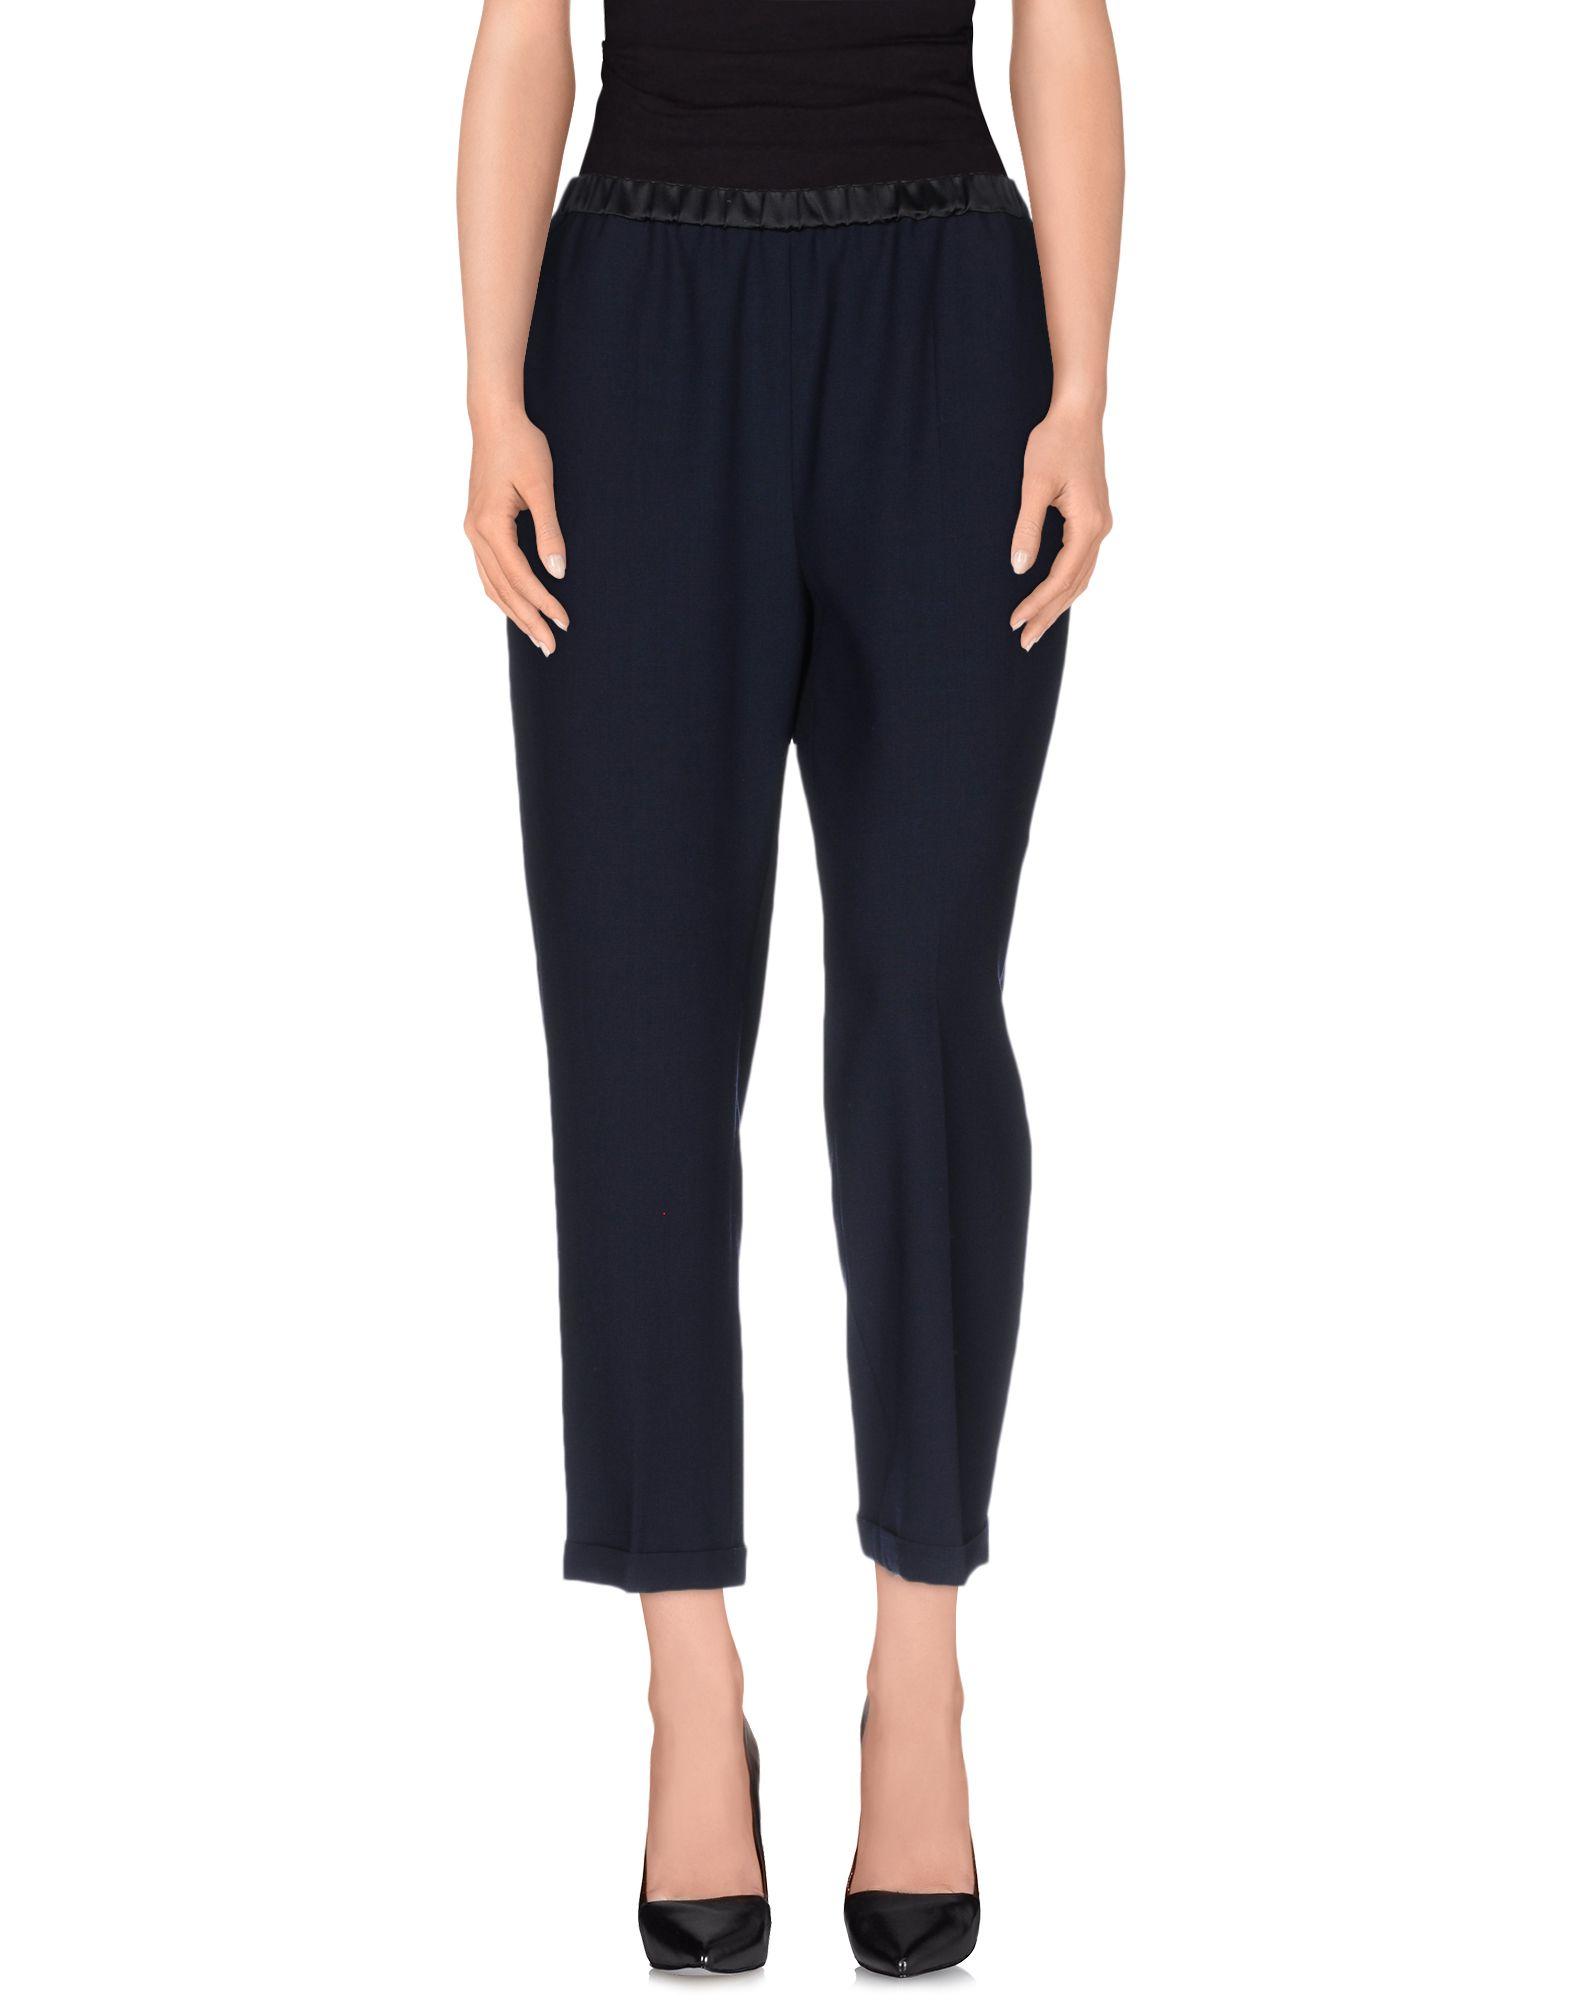 Pantalone True Tradition Donna - Acquista online su Pyx2U